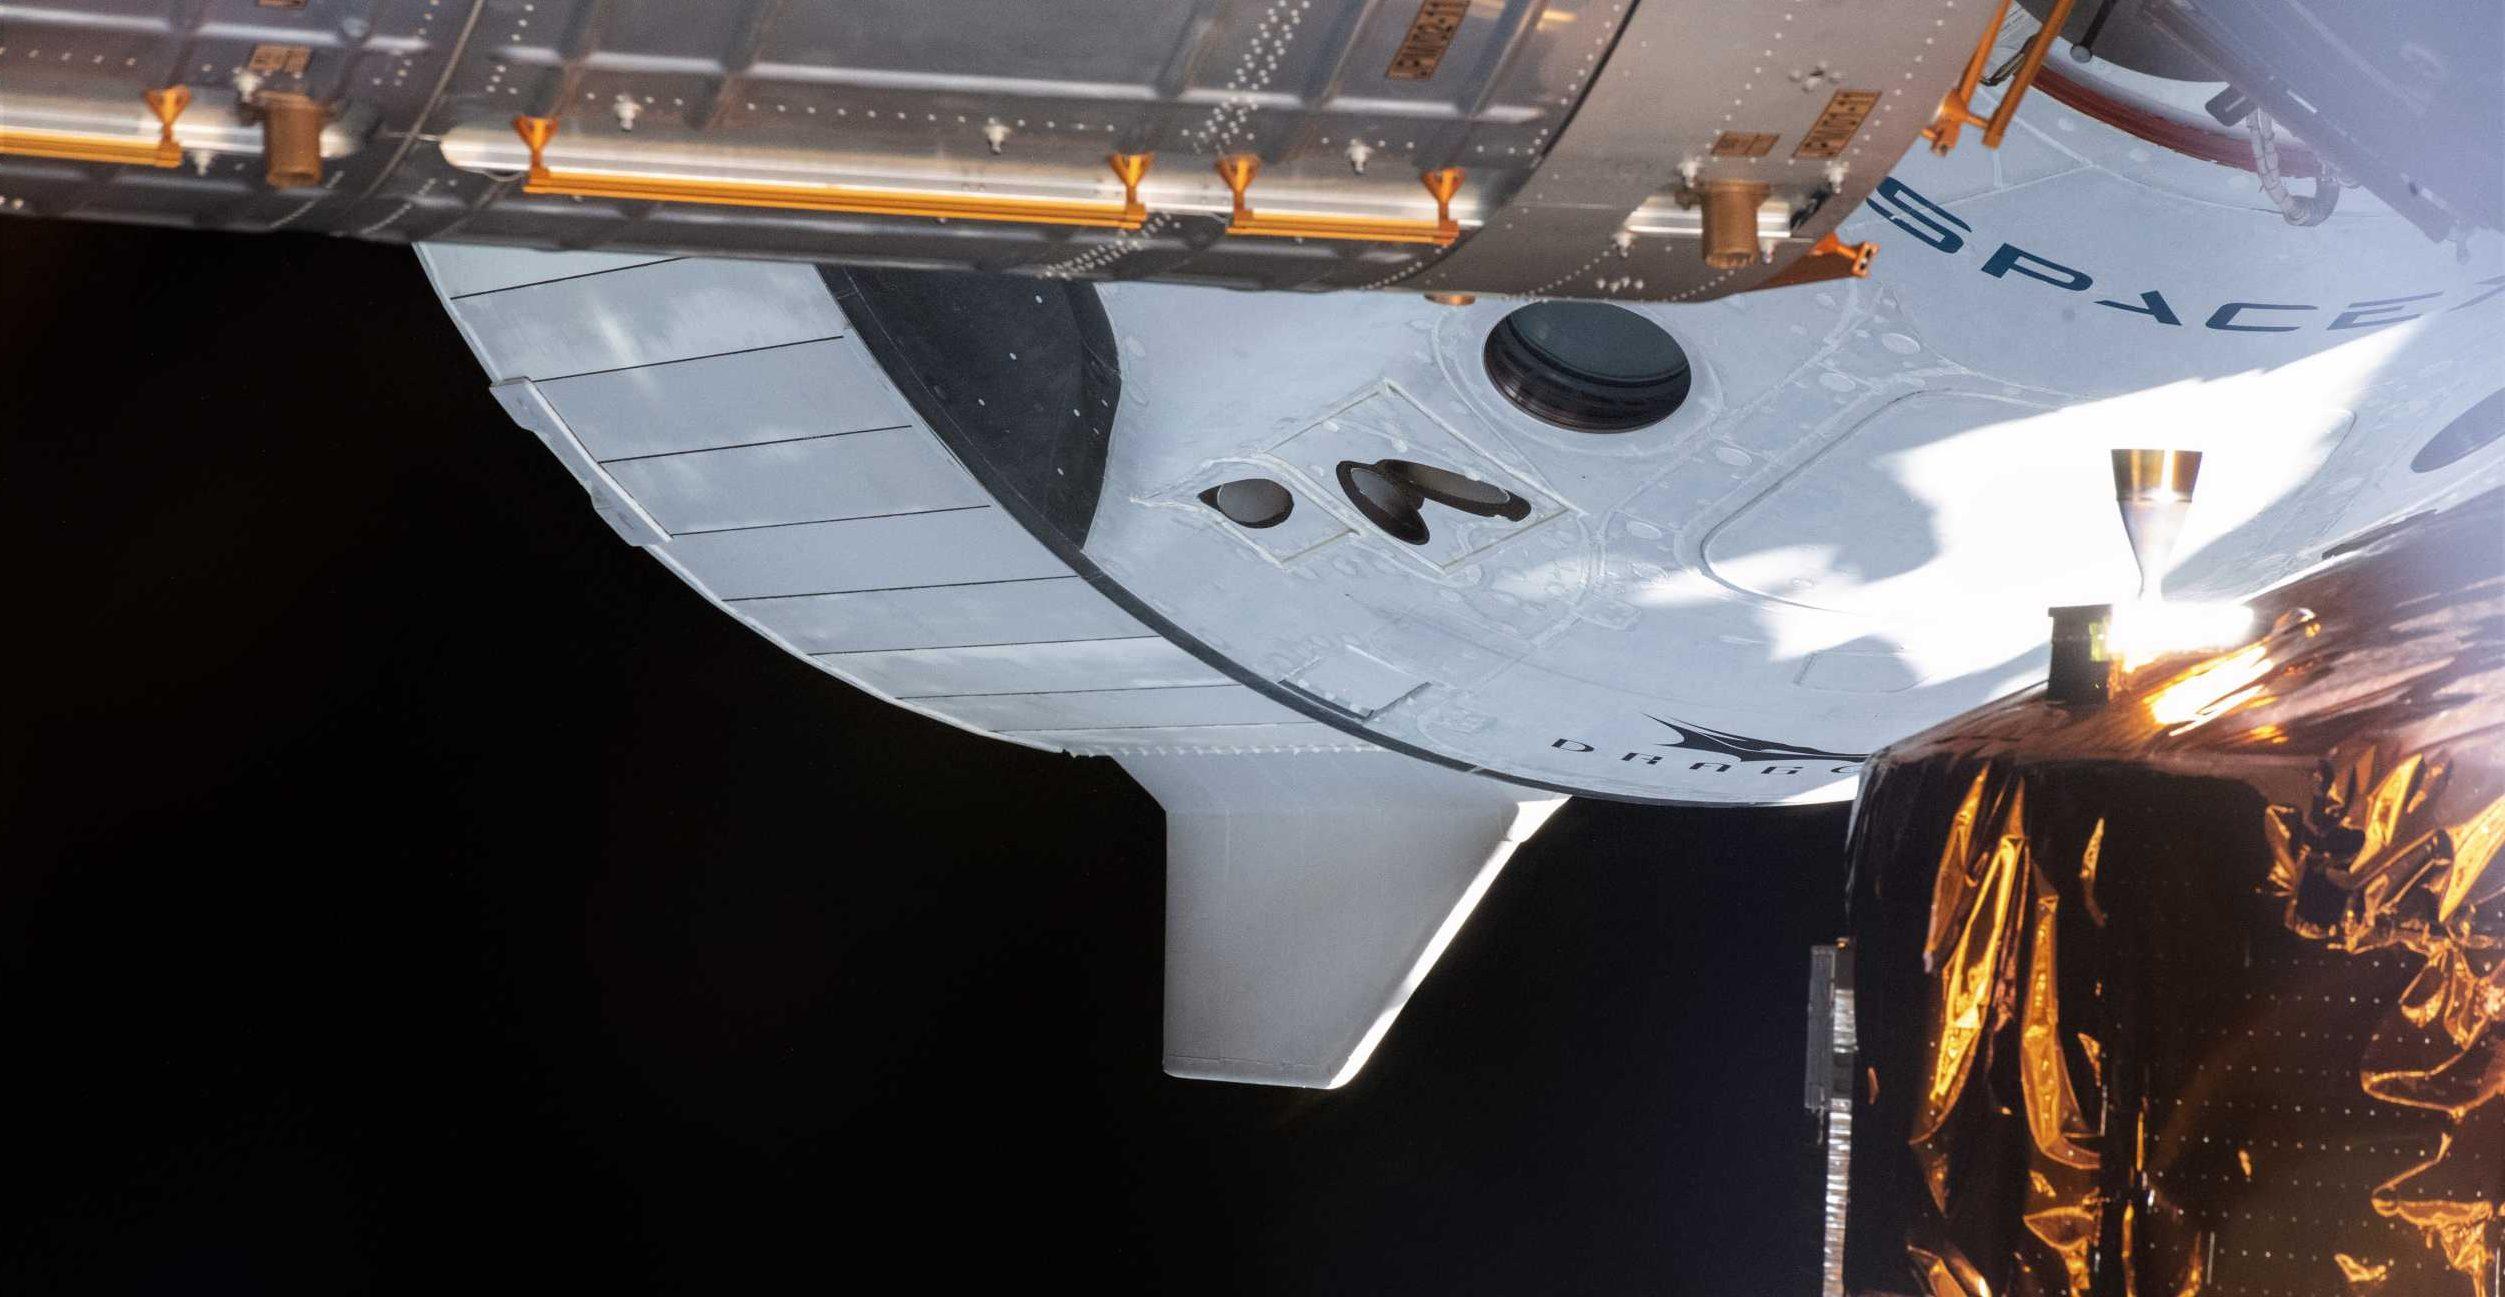 Crew Dragon C206 Demo-2 ISS 060820 (NASA) 1 crop 1 (c)